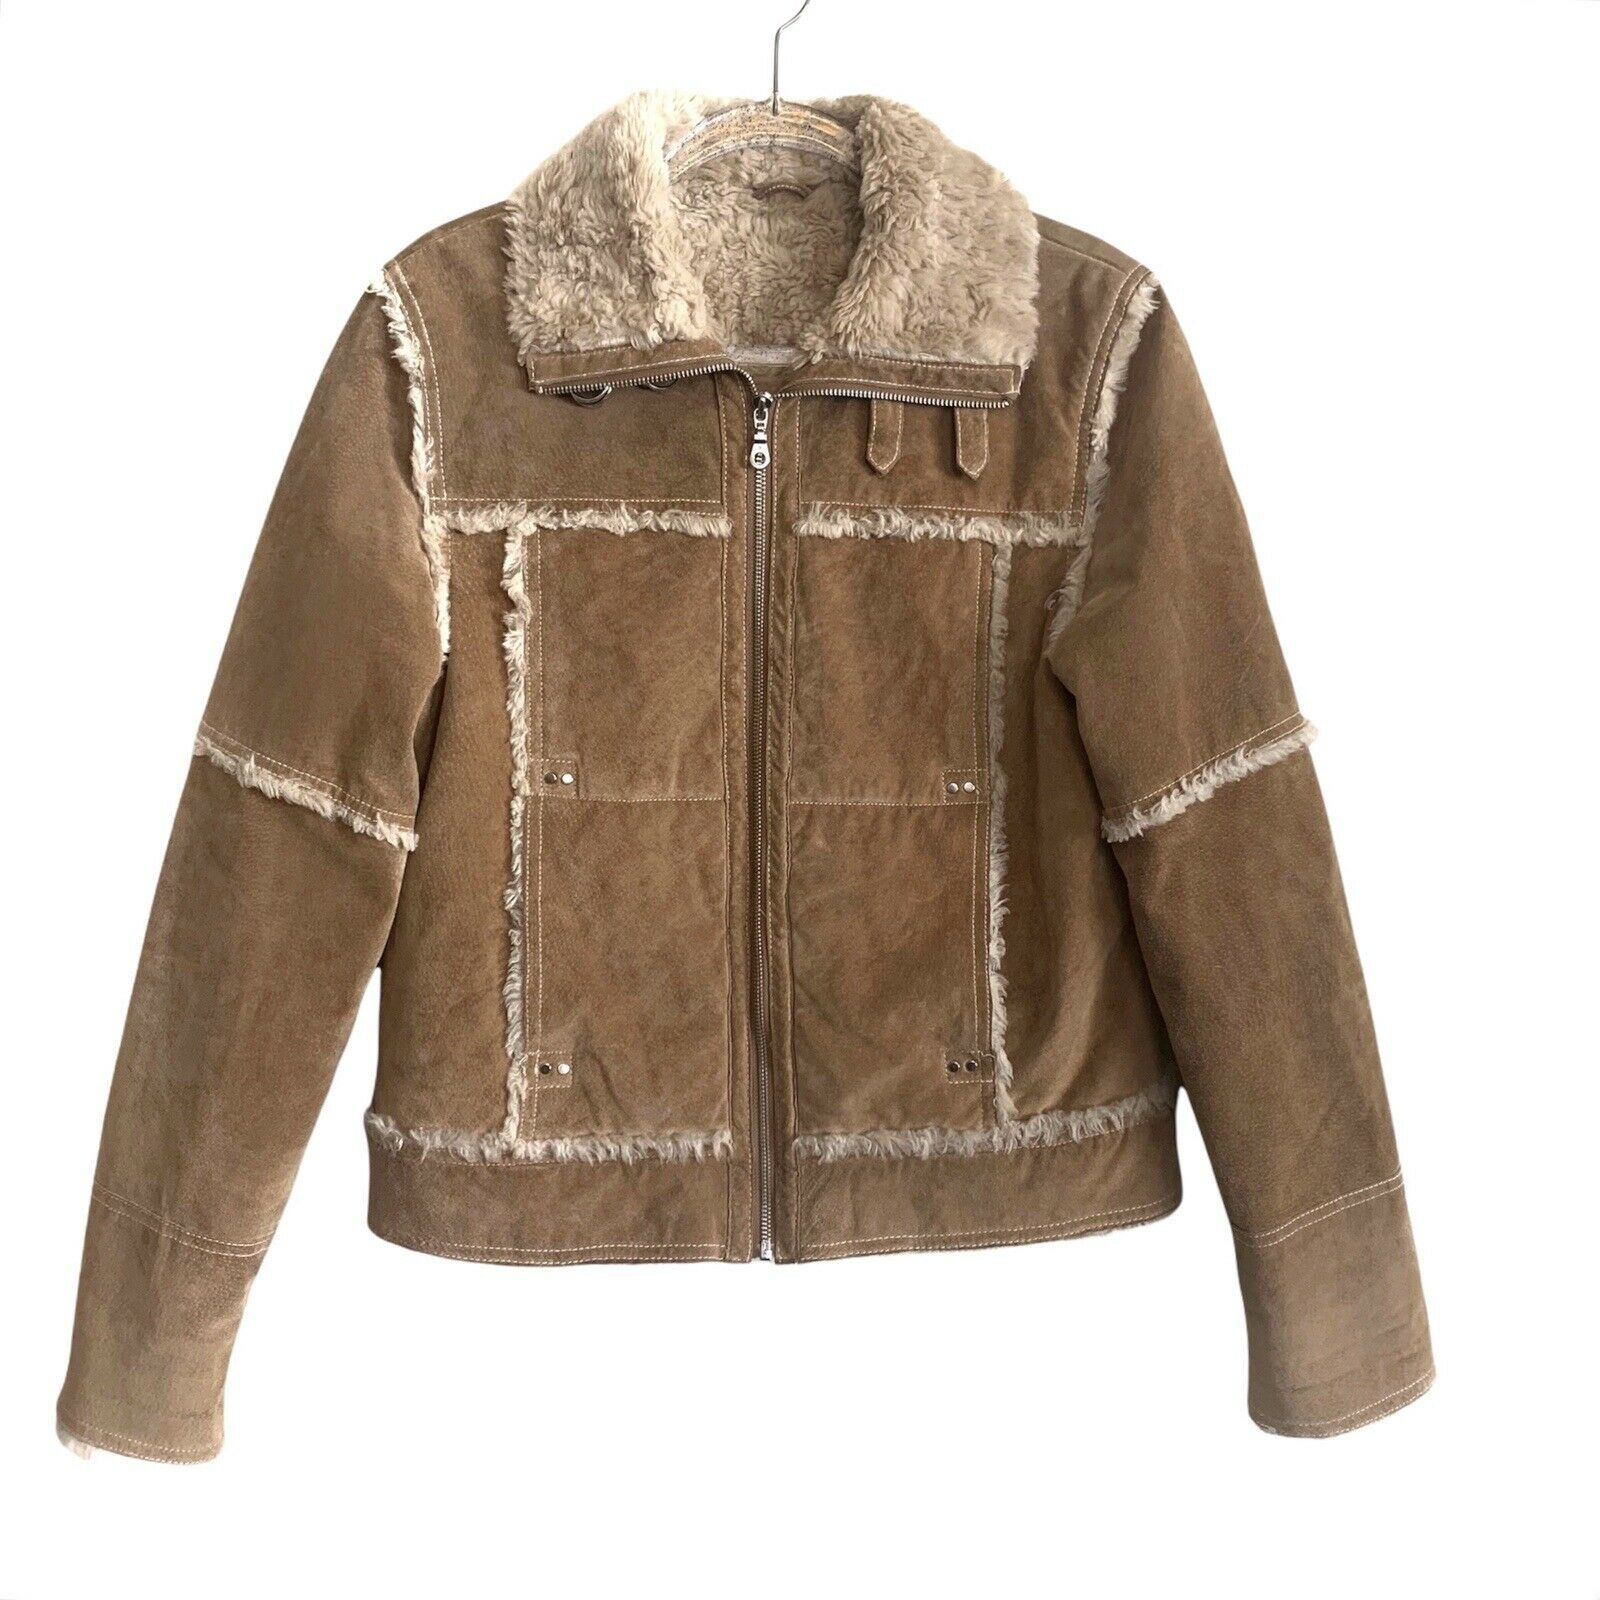 Wilsons Leather Medium Leather Brown Boho Biker Shearling Full Zipper Jacket